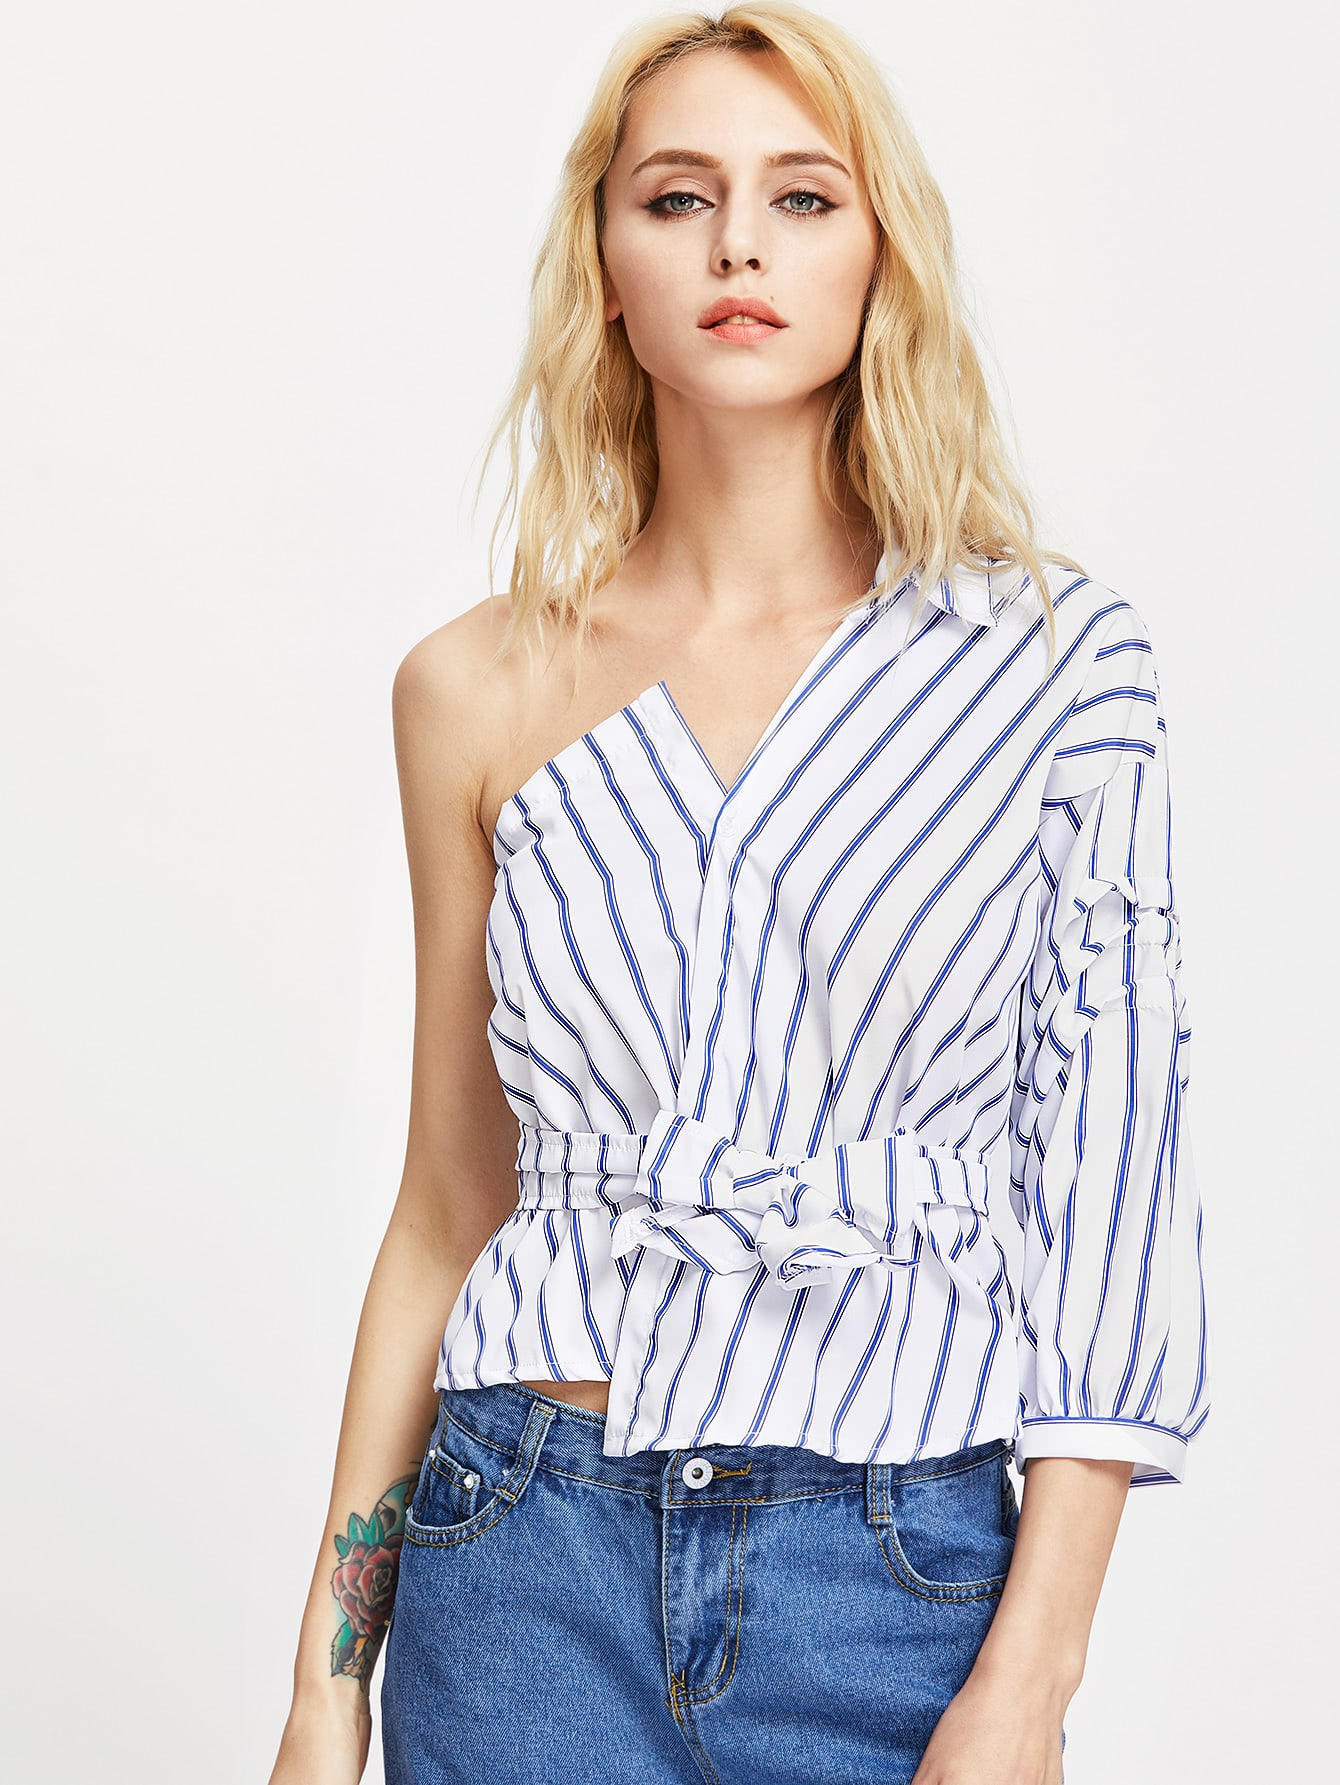 blouse170323101_2